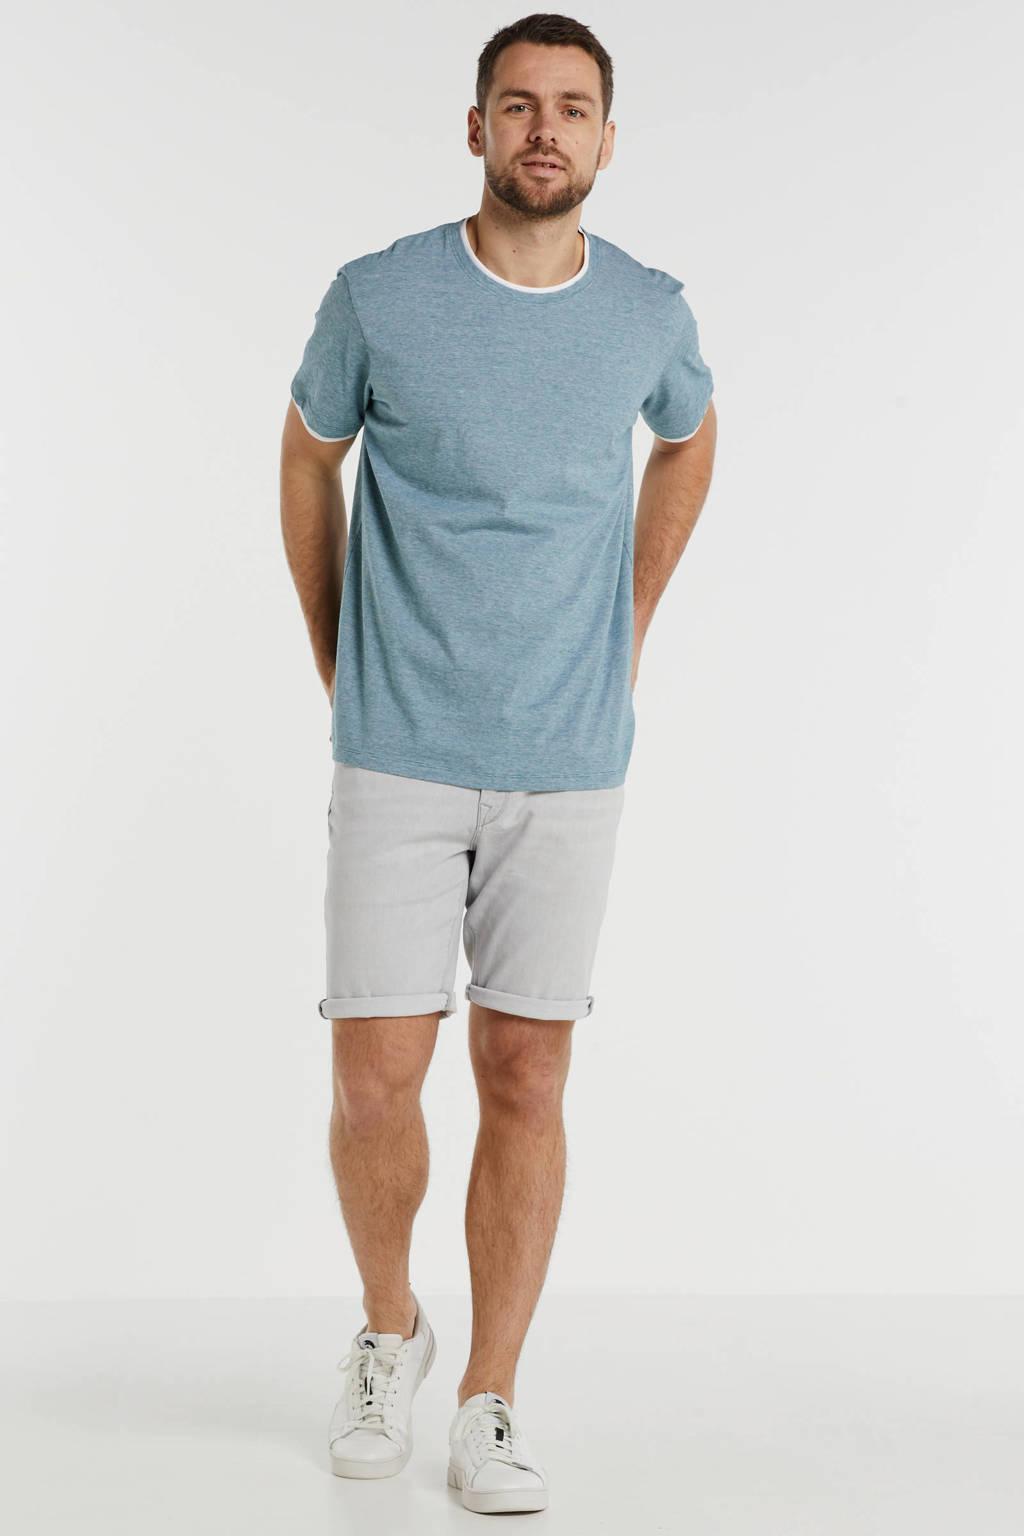 ESPRIT Men Casual T-shirt petrol, Petrol